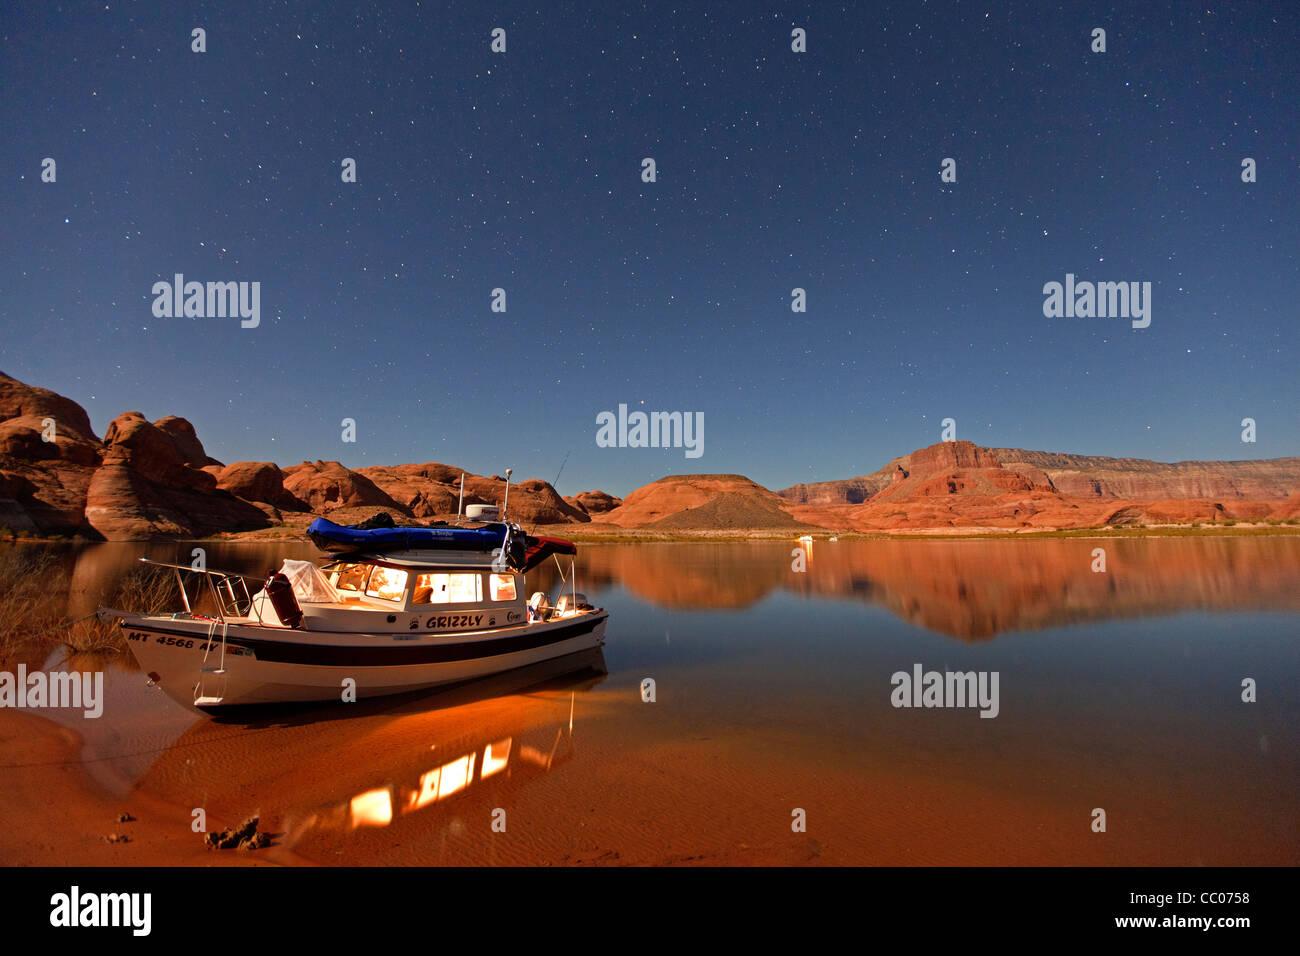 Dory Boat Stock Photos & Dory Boat Stock Images - Alamy